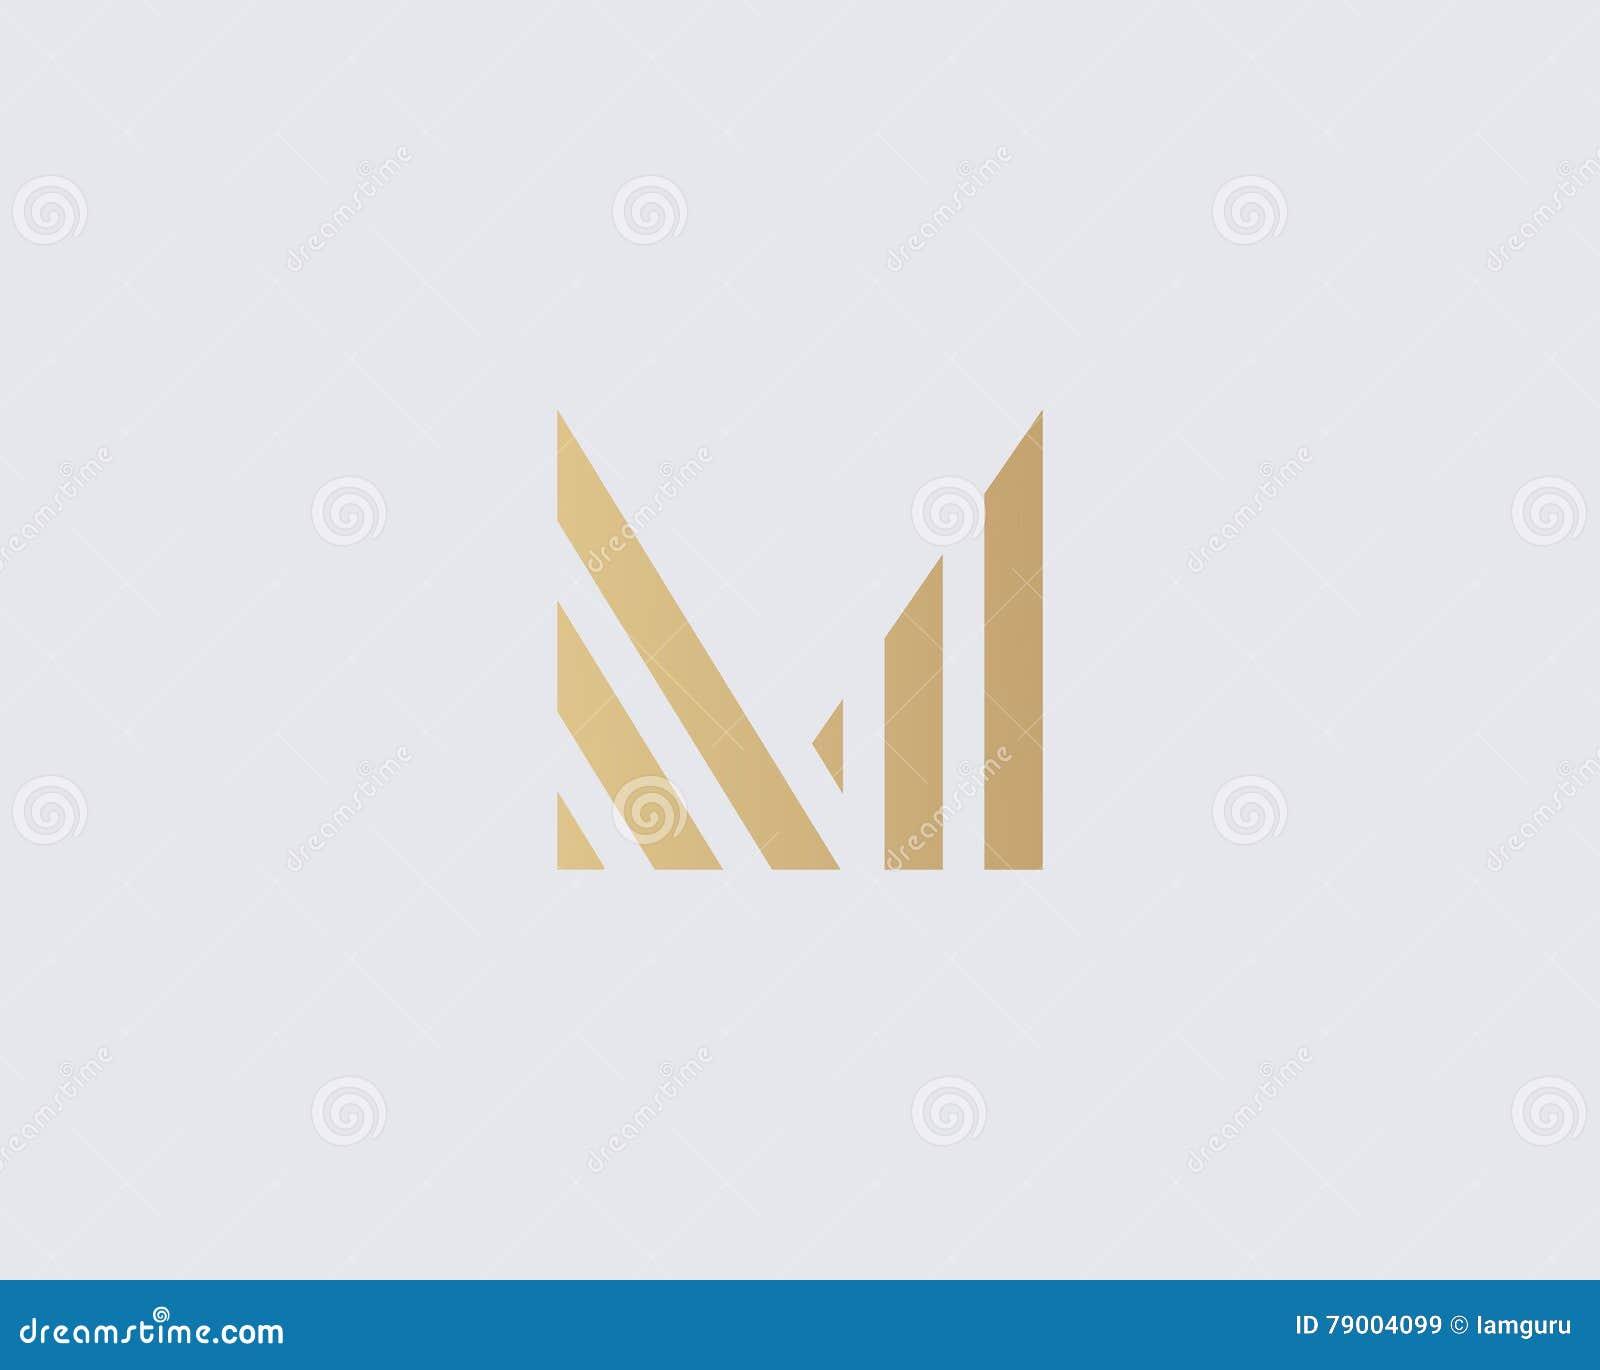 50+ Cool Letter M Logo Design Showcase - Hative